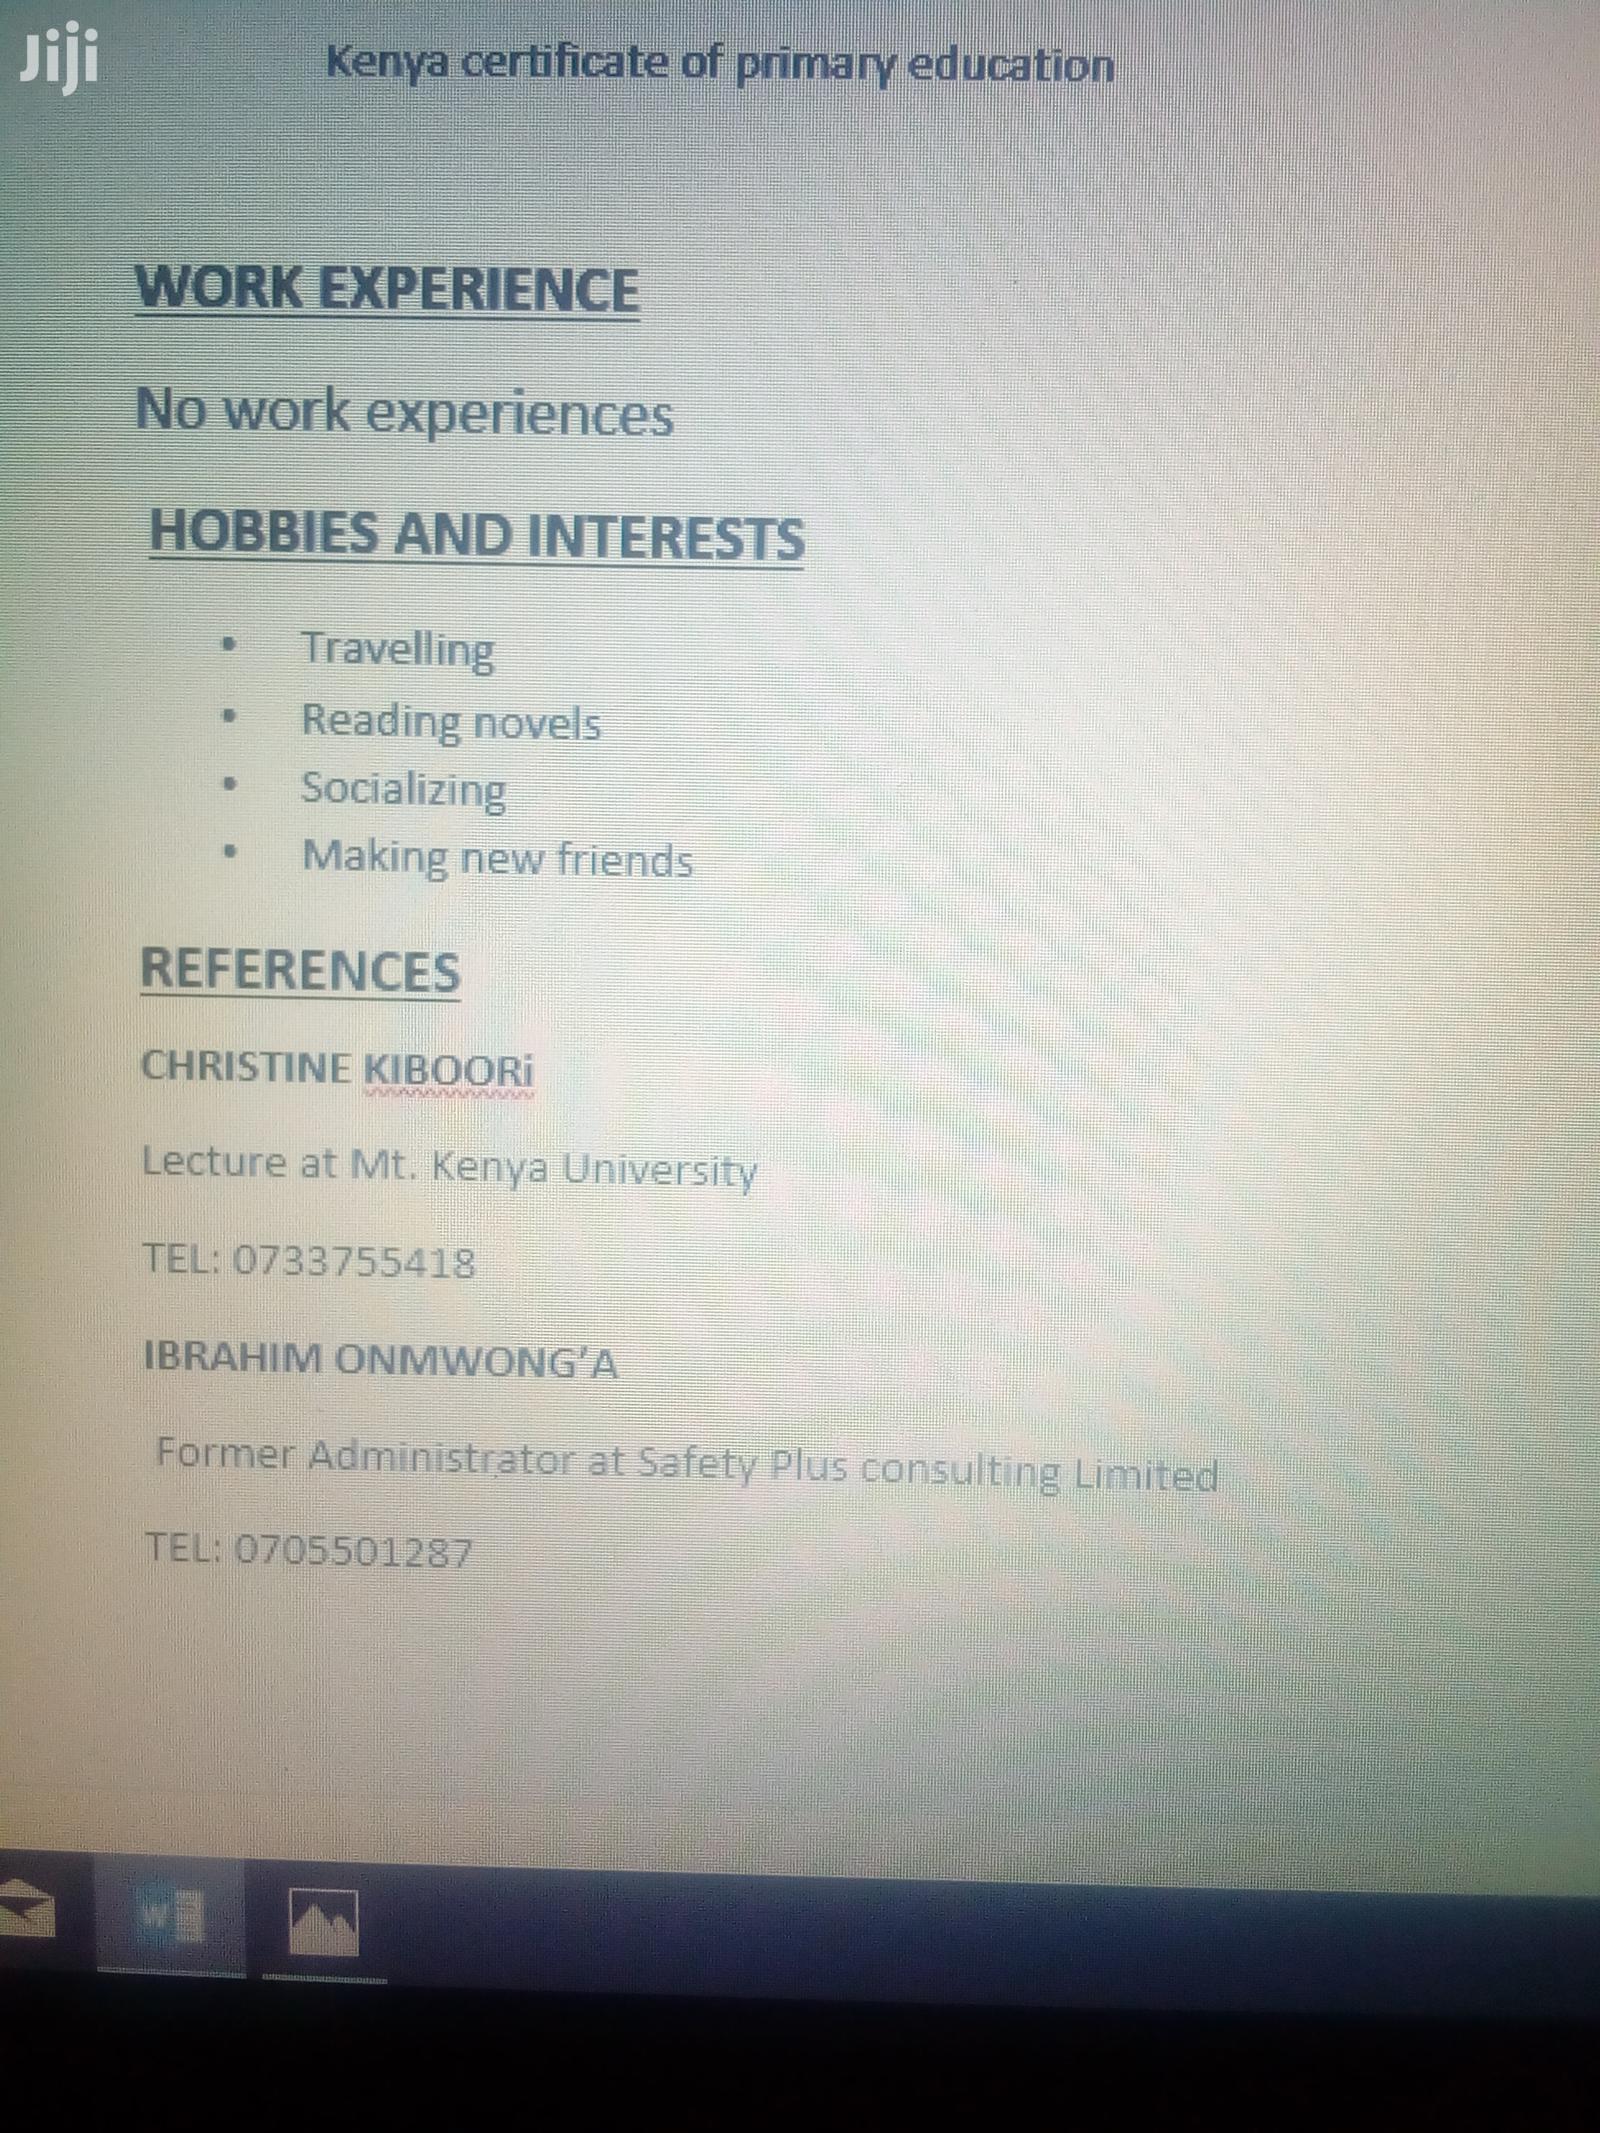 IT and Agribusiness   Advertising & Marketing CVs for sale in Kiambu / Kiambu , Kiambu, Kenya